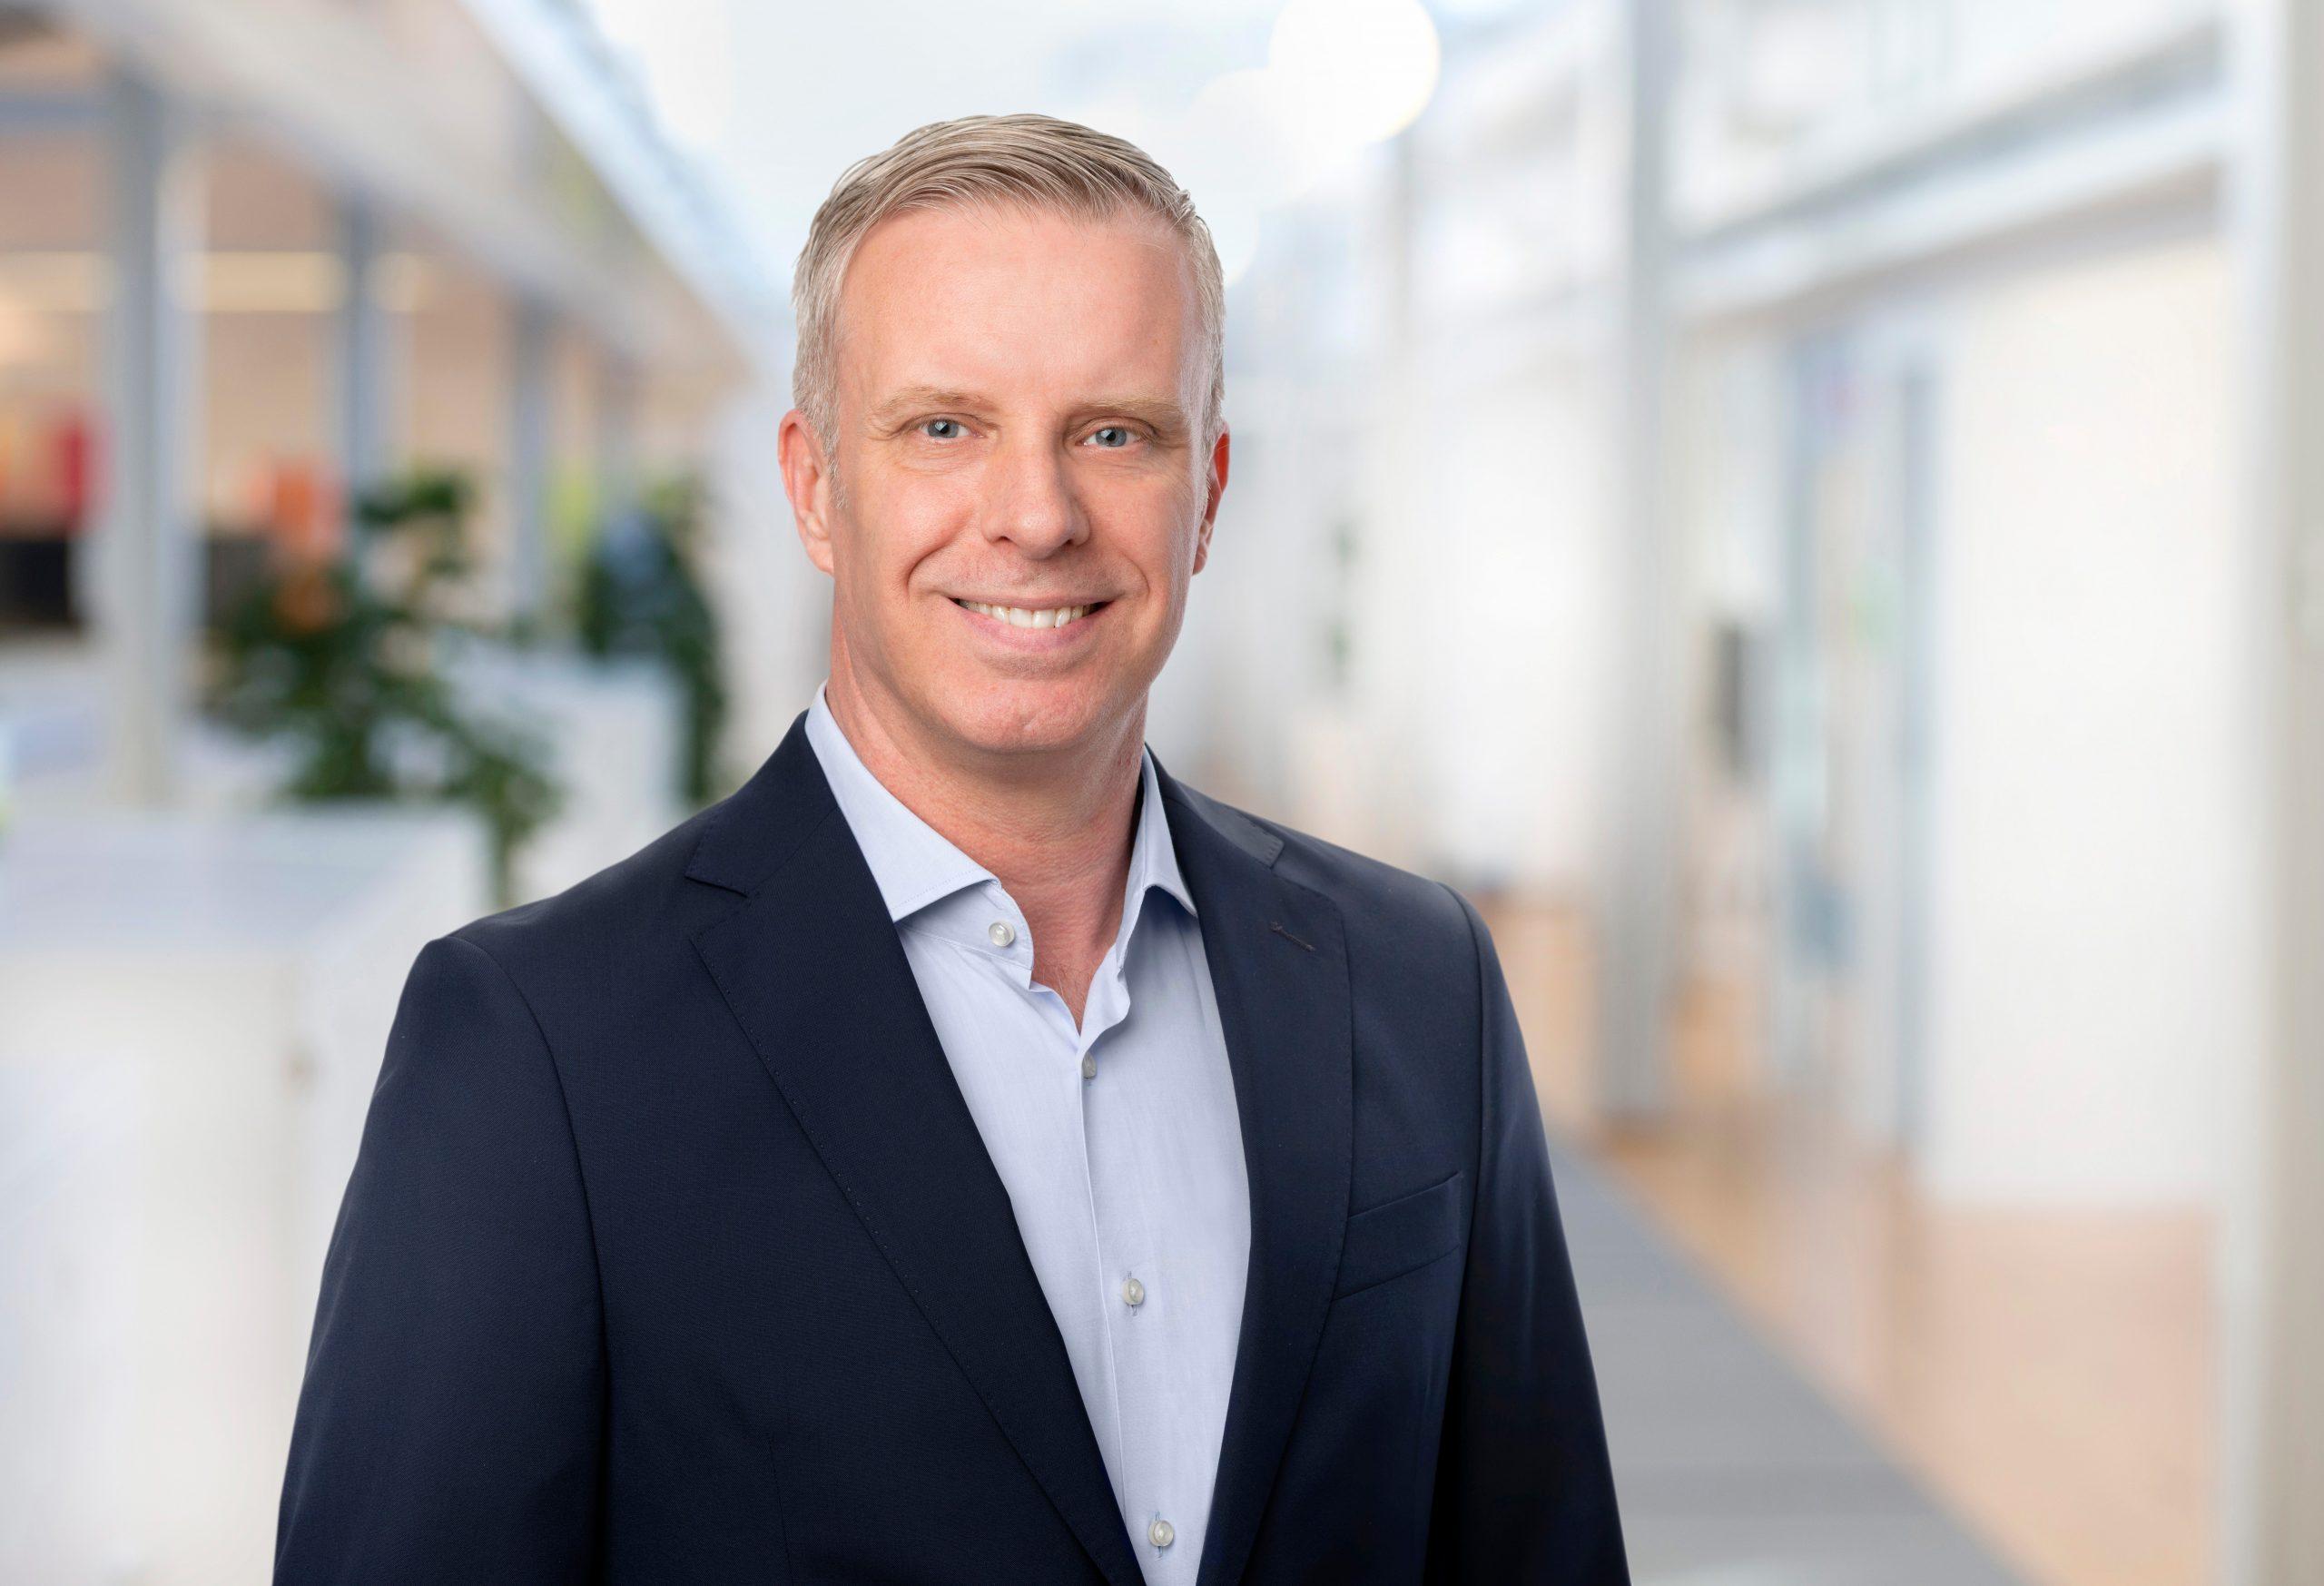 Svenske Johan Nordqvist er ny country manager for reservationssystemet Amadeus i Skandinavien. PR-foto.